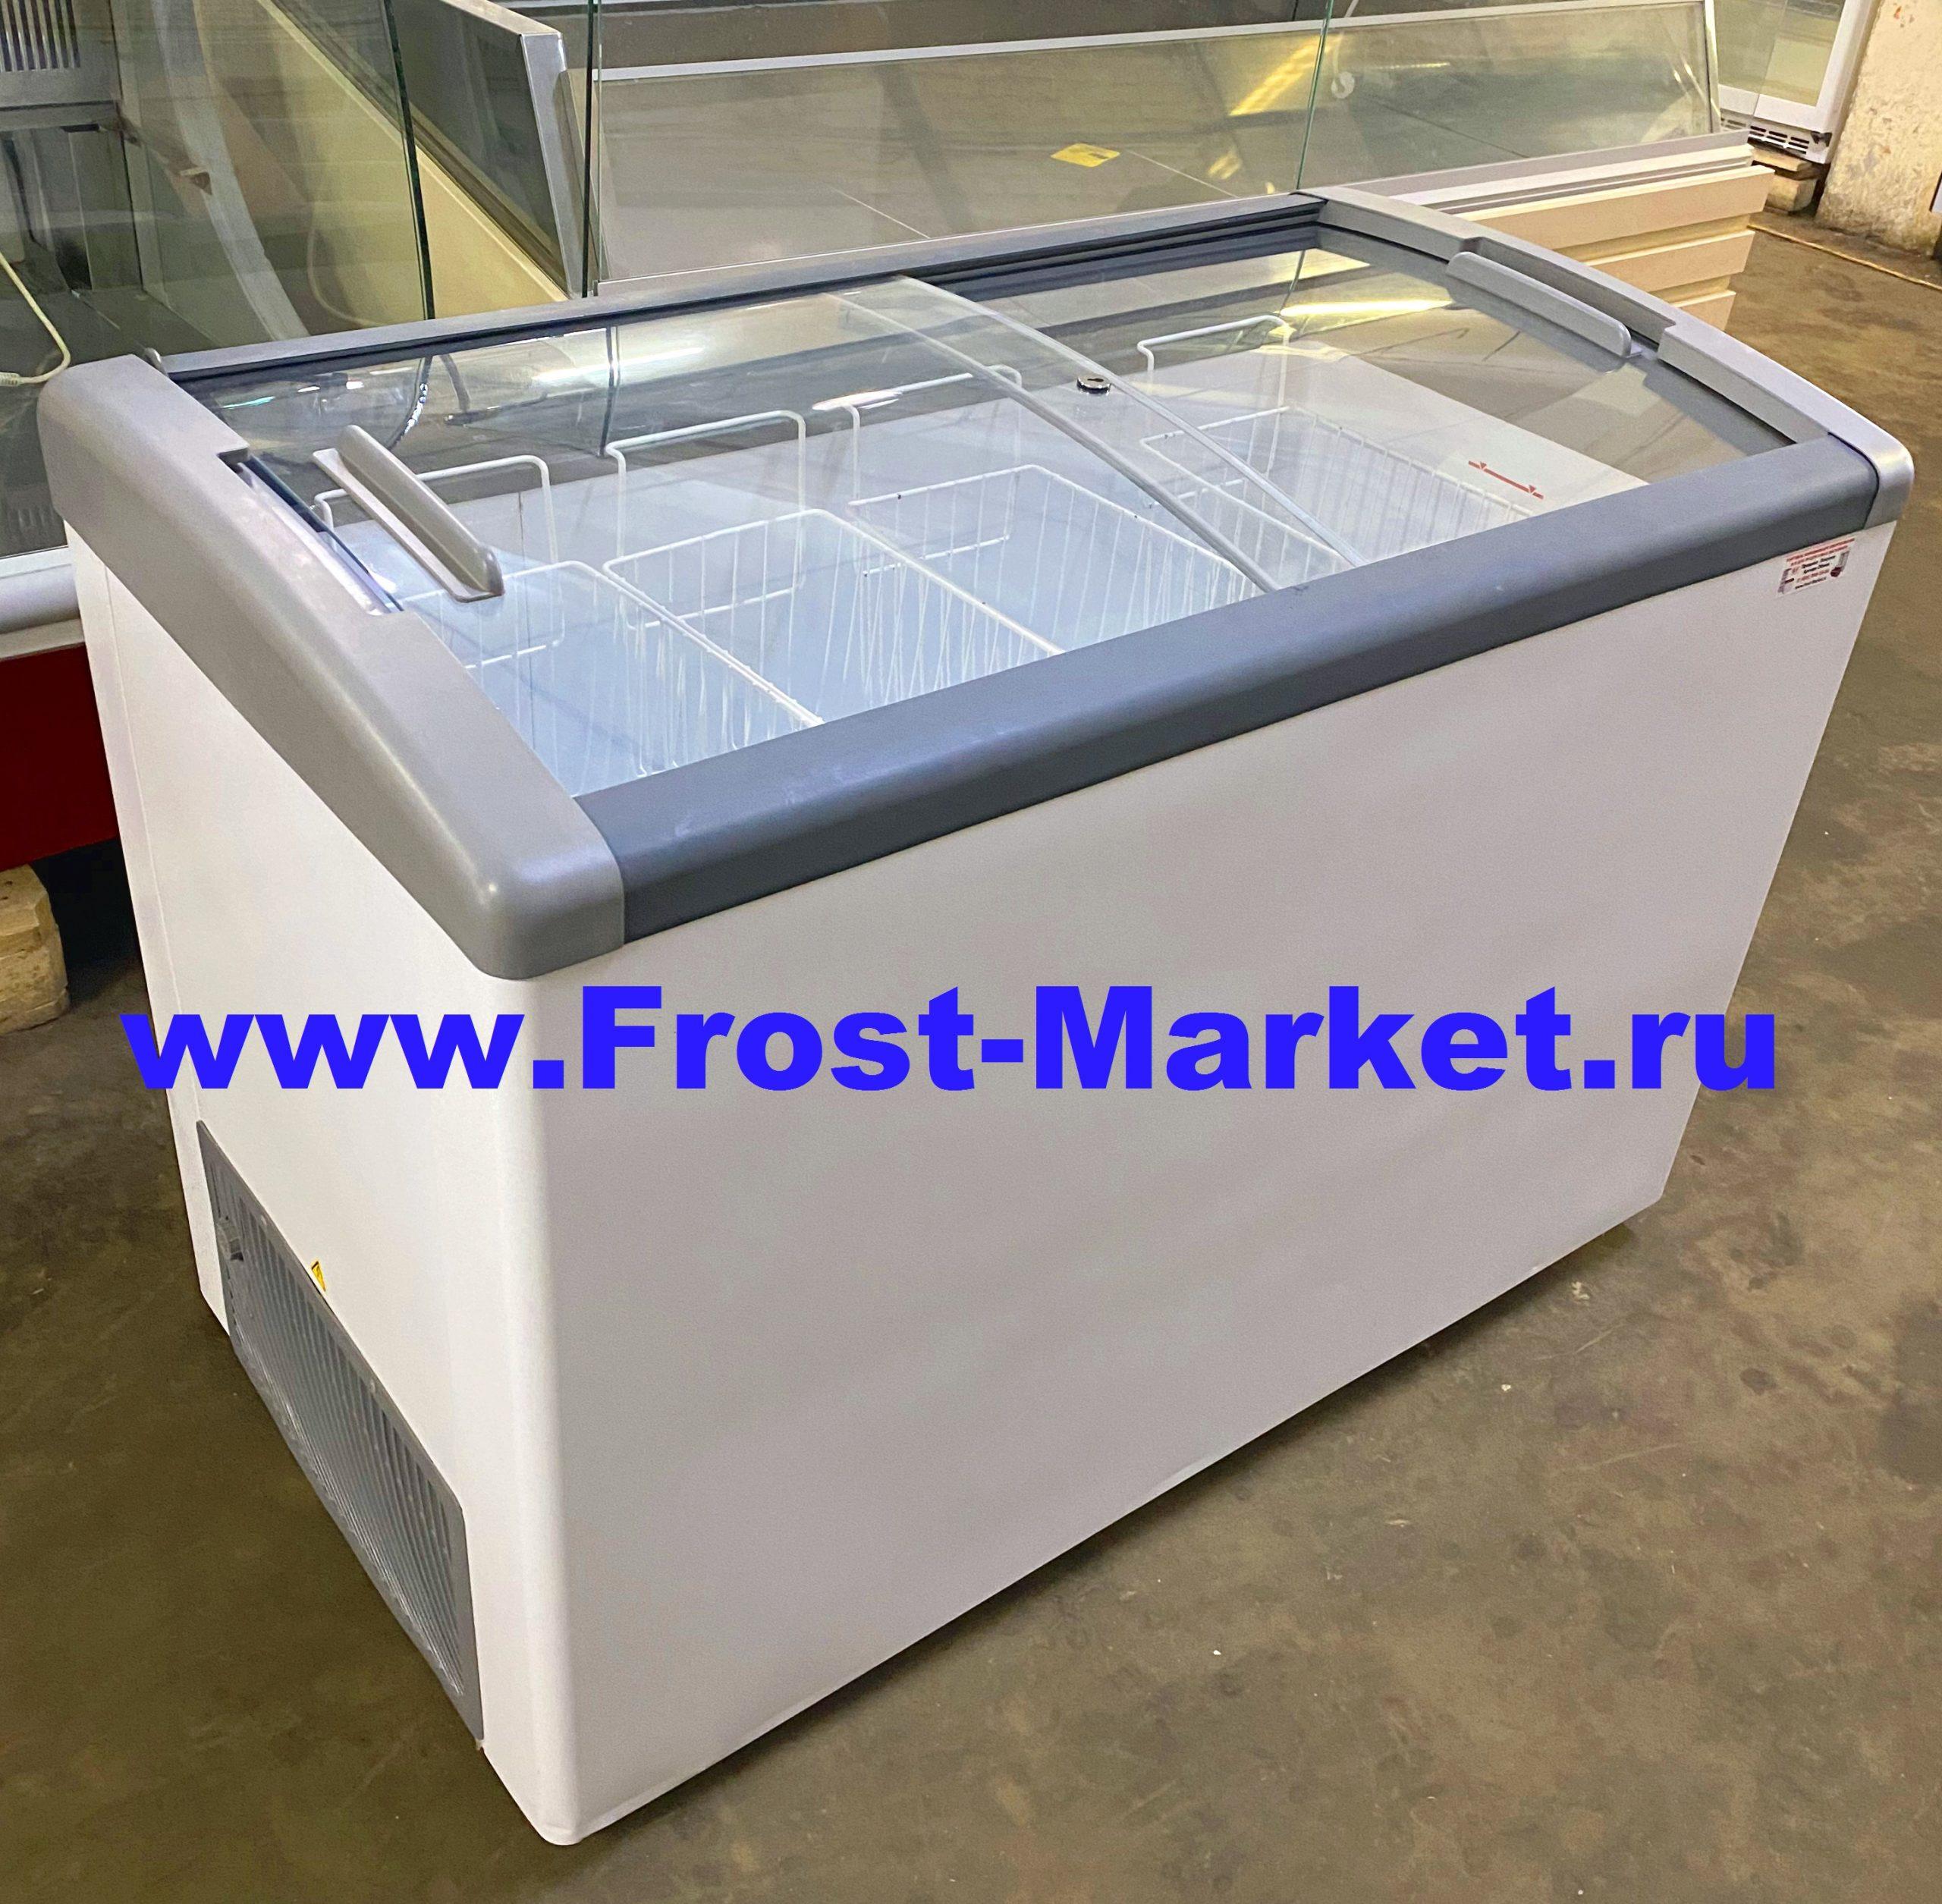 Ларь морозильный б у Gellar FG 475 E